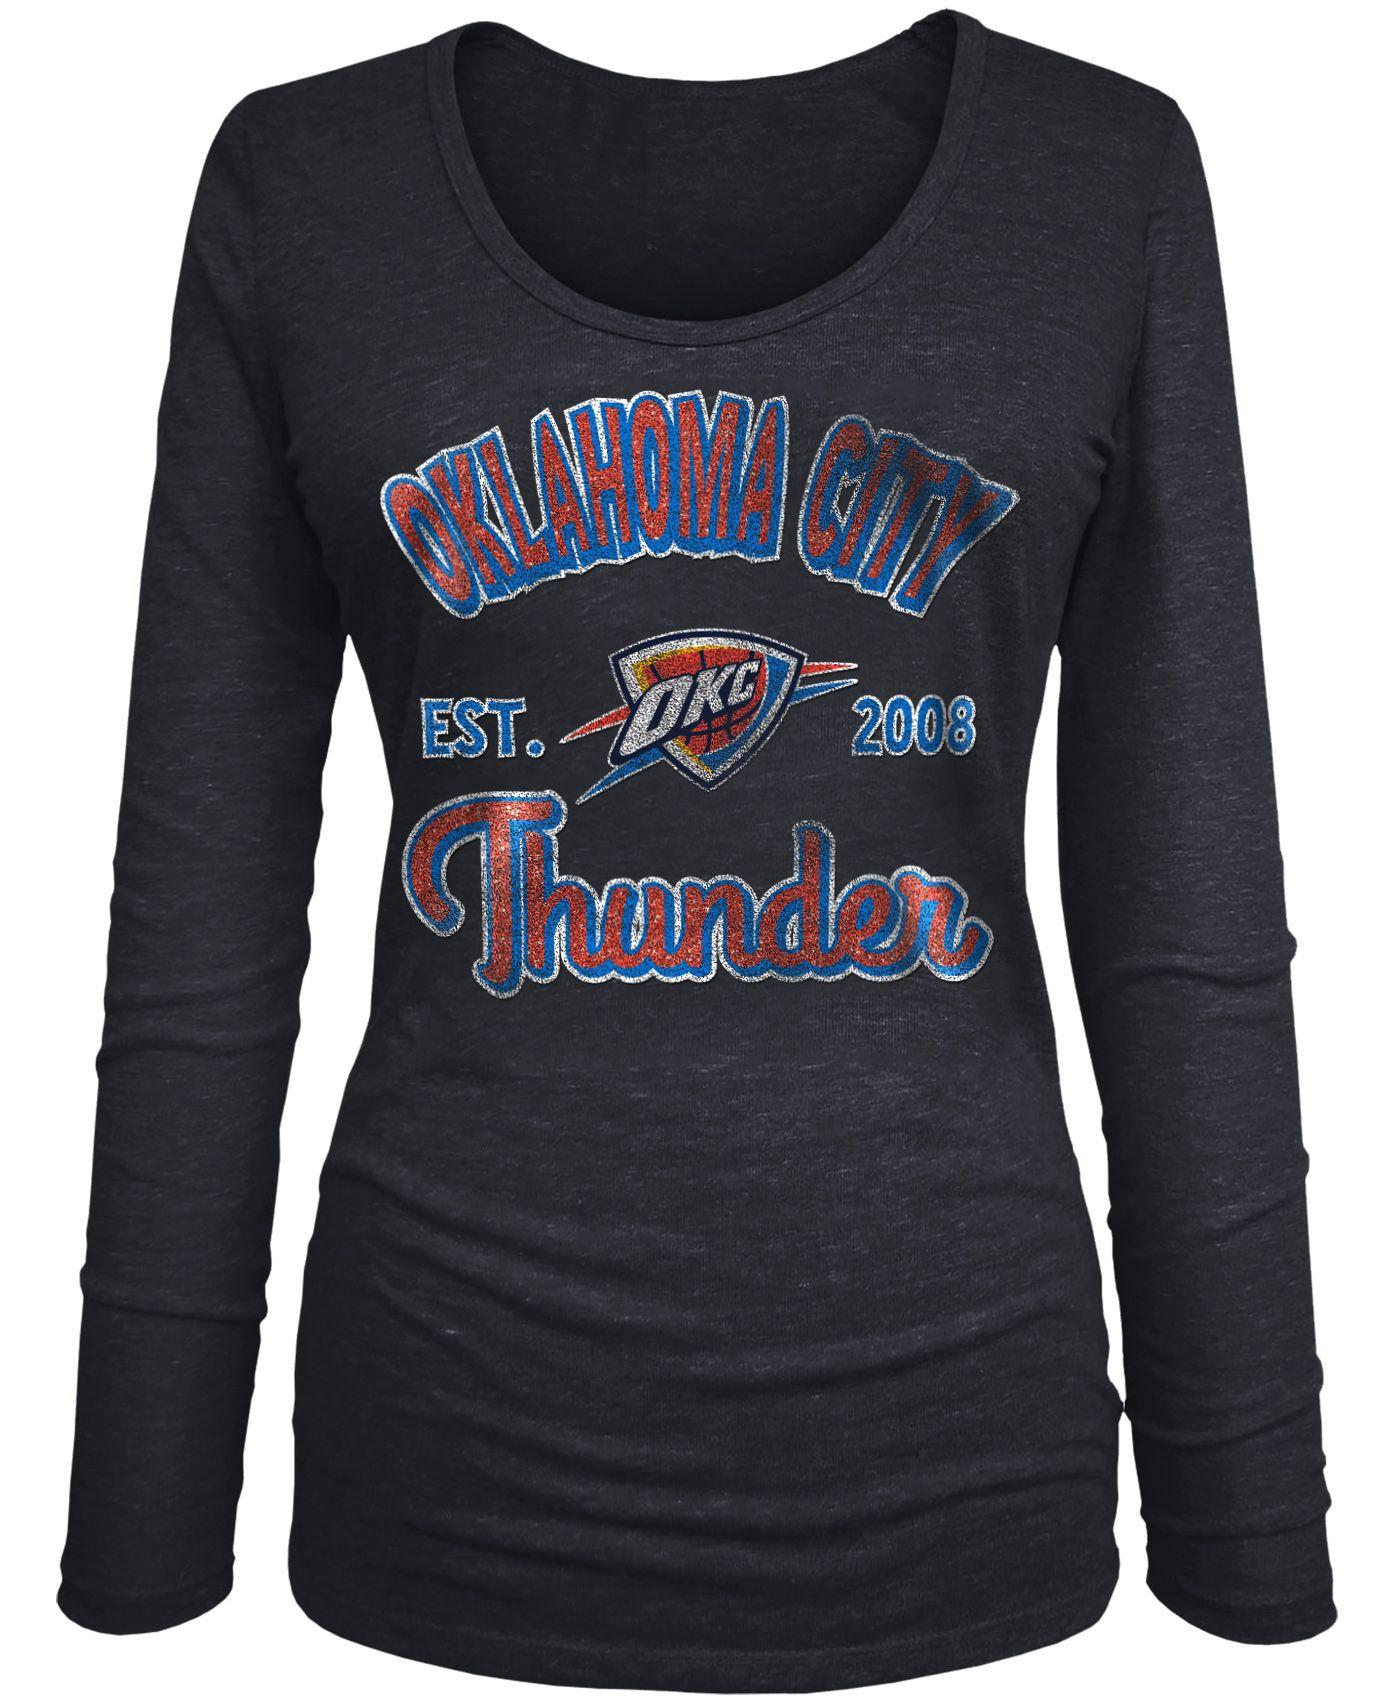 New Era Women's Oklahoma City Thunder Tri-Blend Long Sleeve Shirt